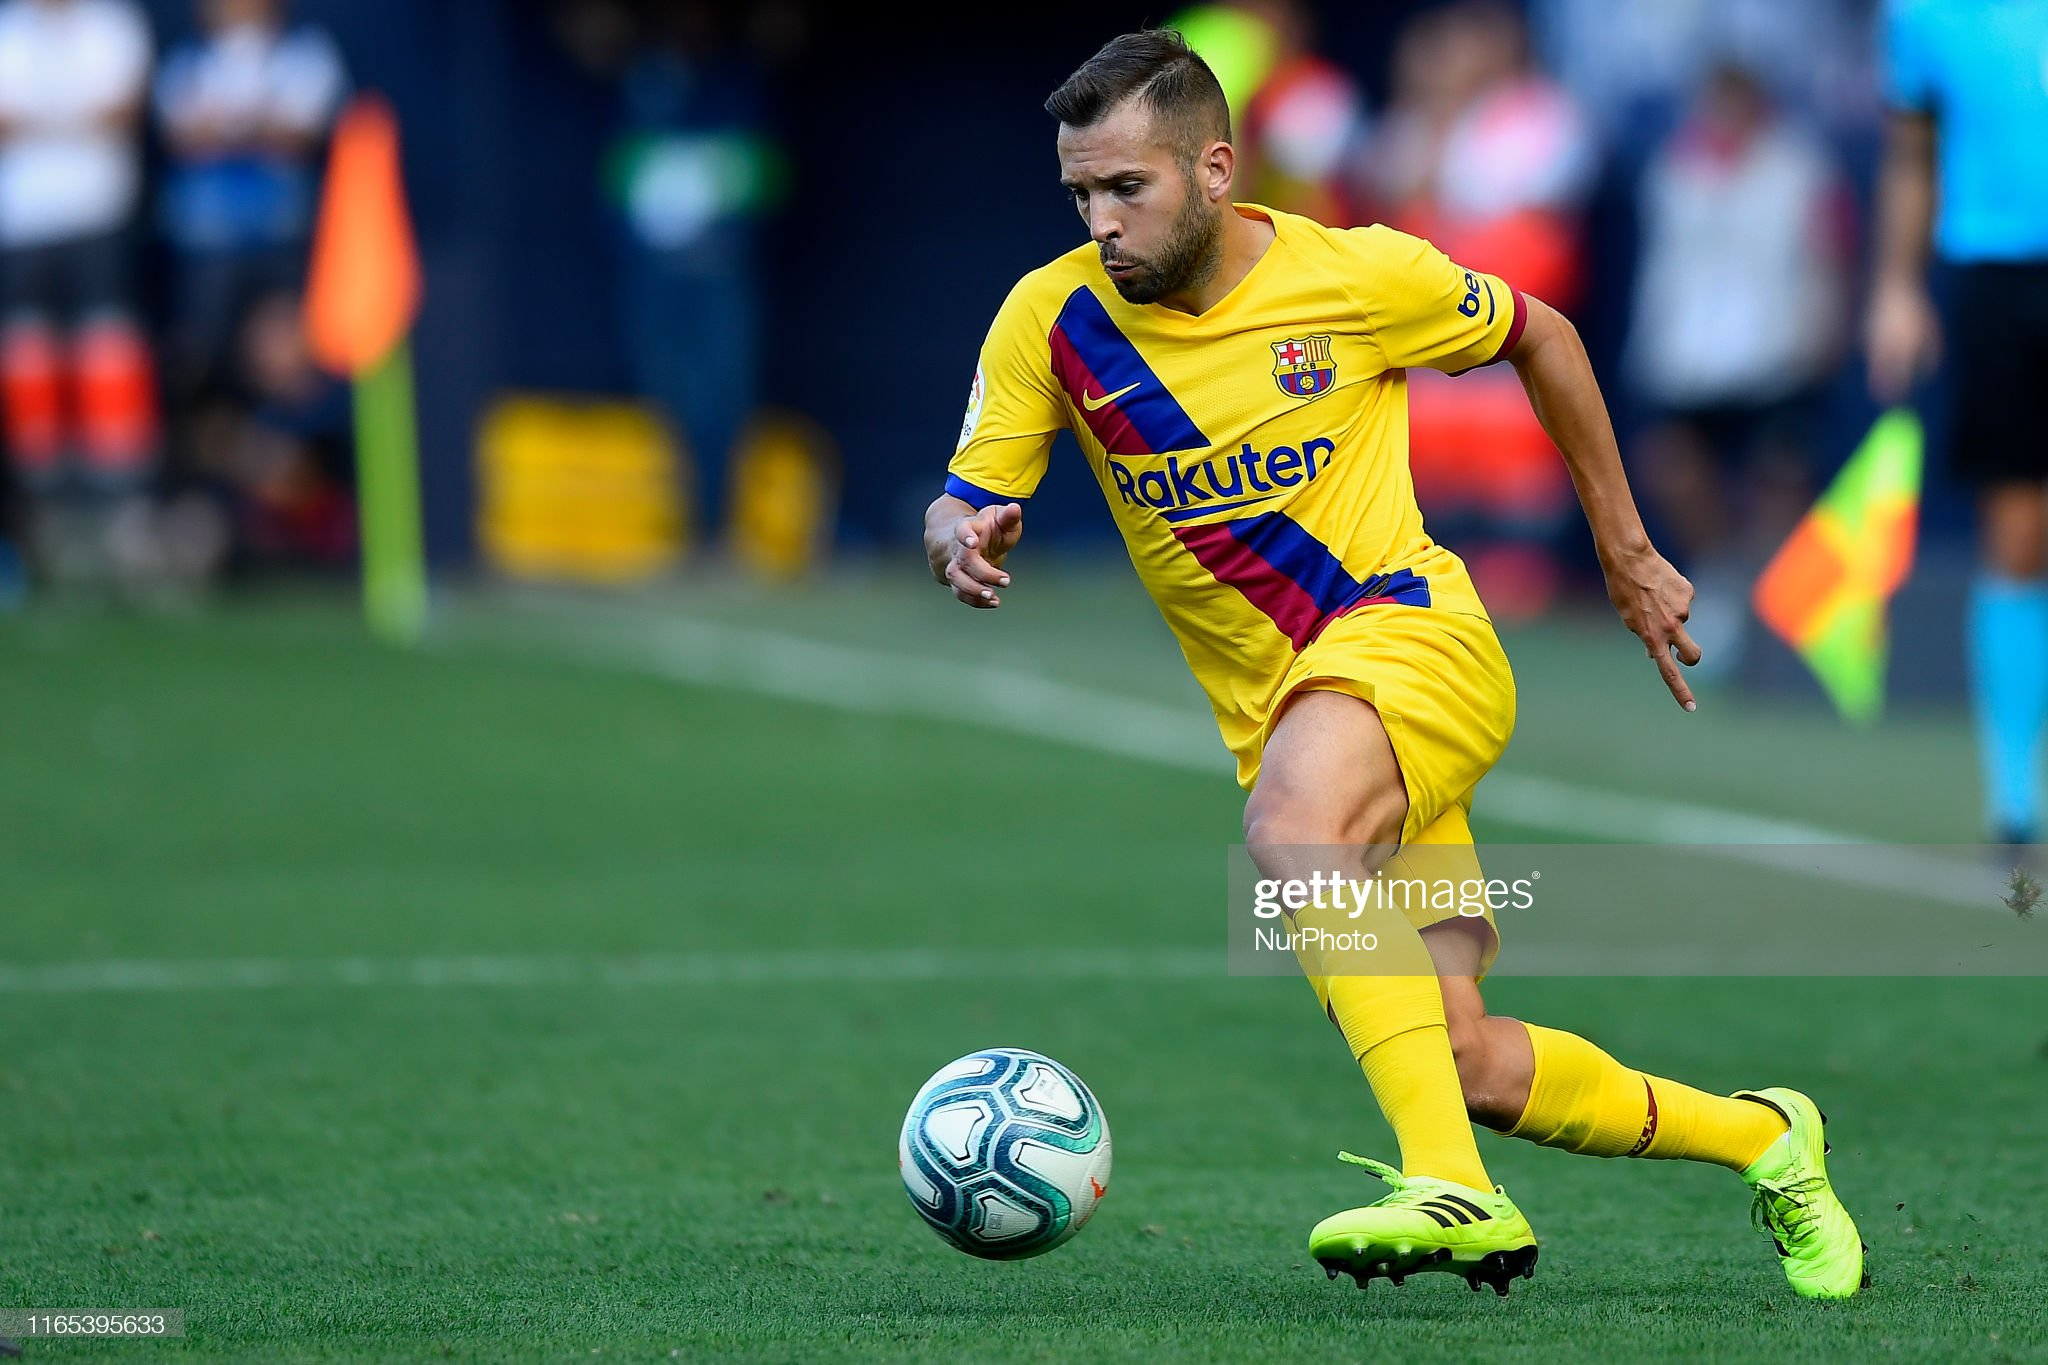 صور مباراة : أوساسونا - برشلونة 2-2 ( 31-08-2019 )  Jordi-alba-of-barcelona-ina-action-during-the-liga-match-between-ca-picture-id1165395633?s=2048x2048